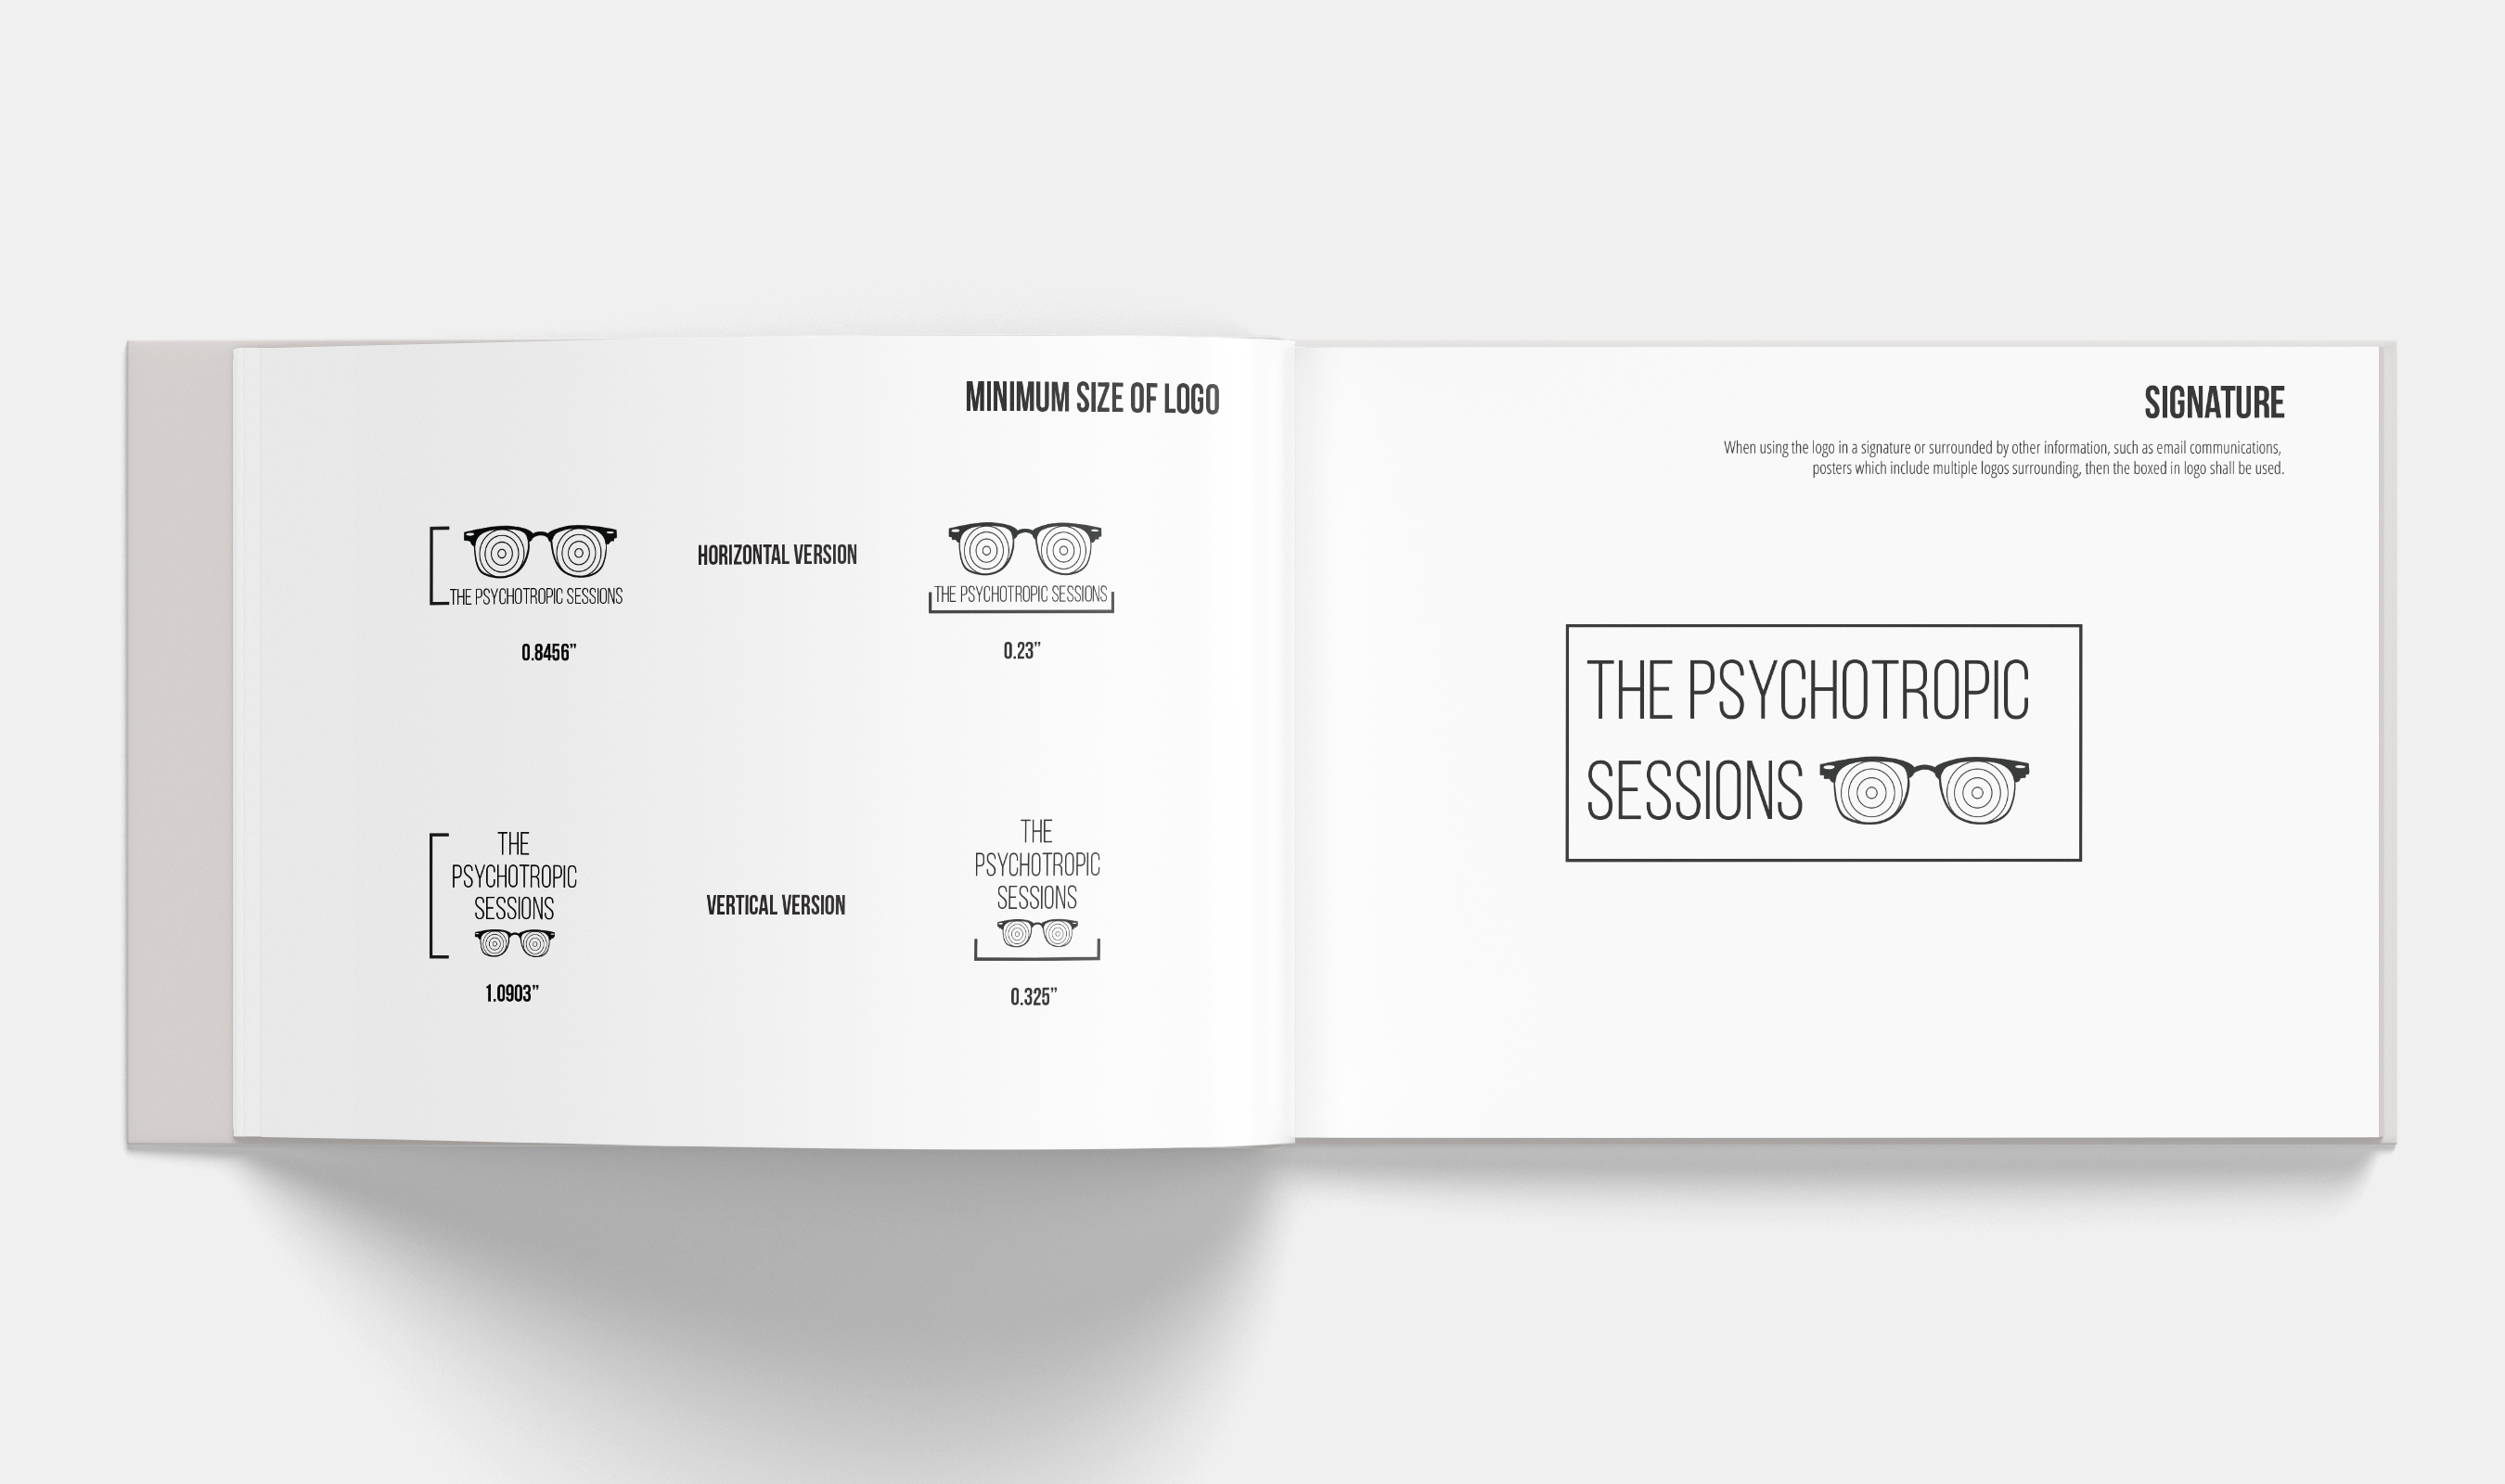 graphic-standards-festival-sample-info